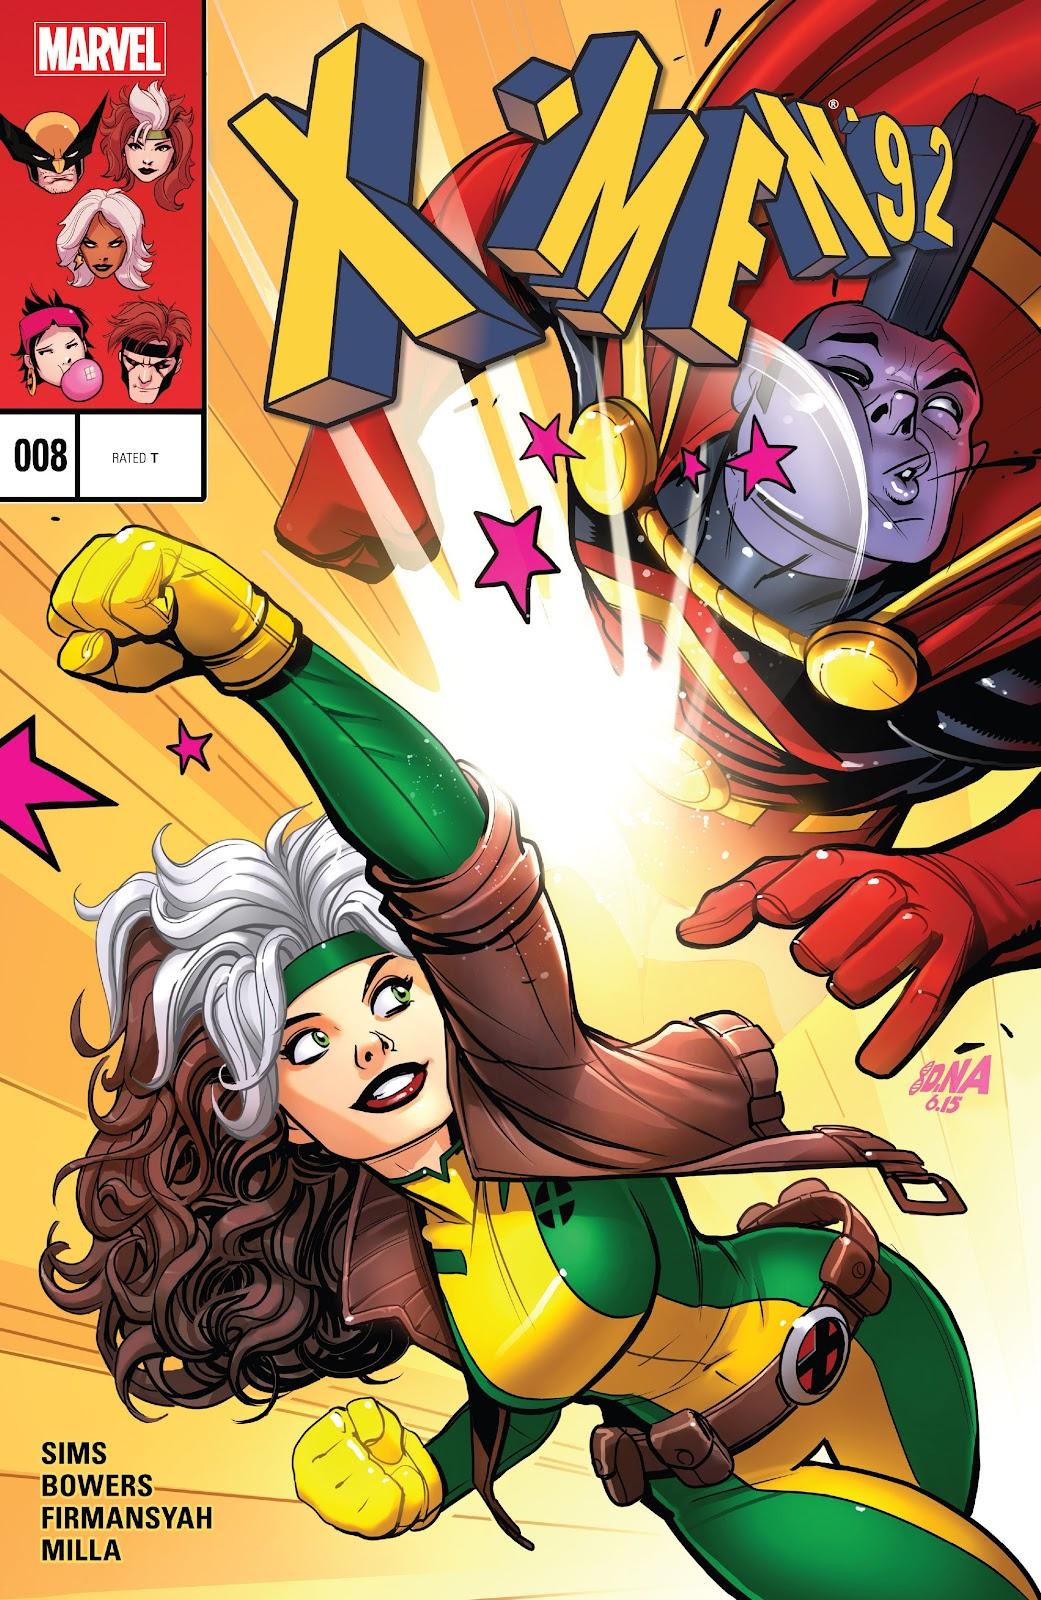 X-Men 92 (2016) 8 Page 1